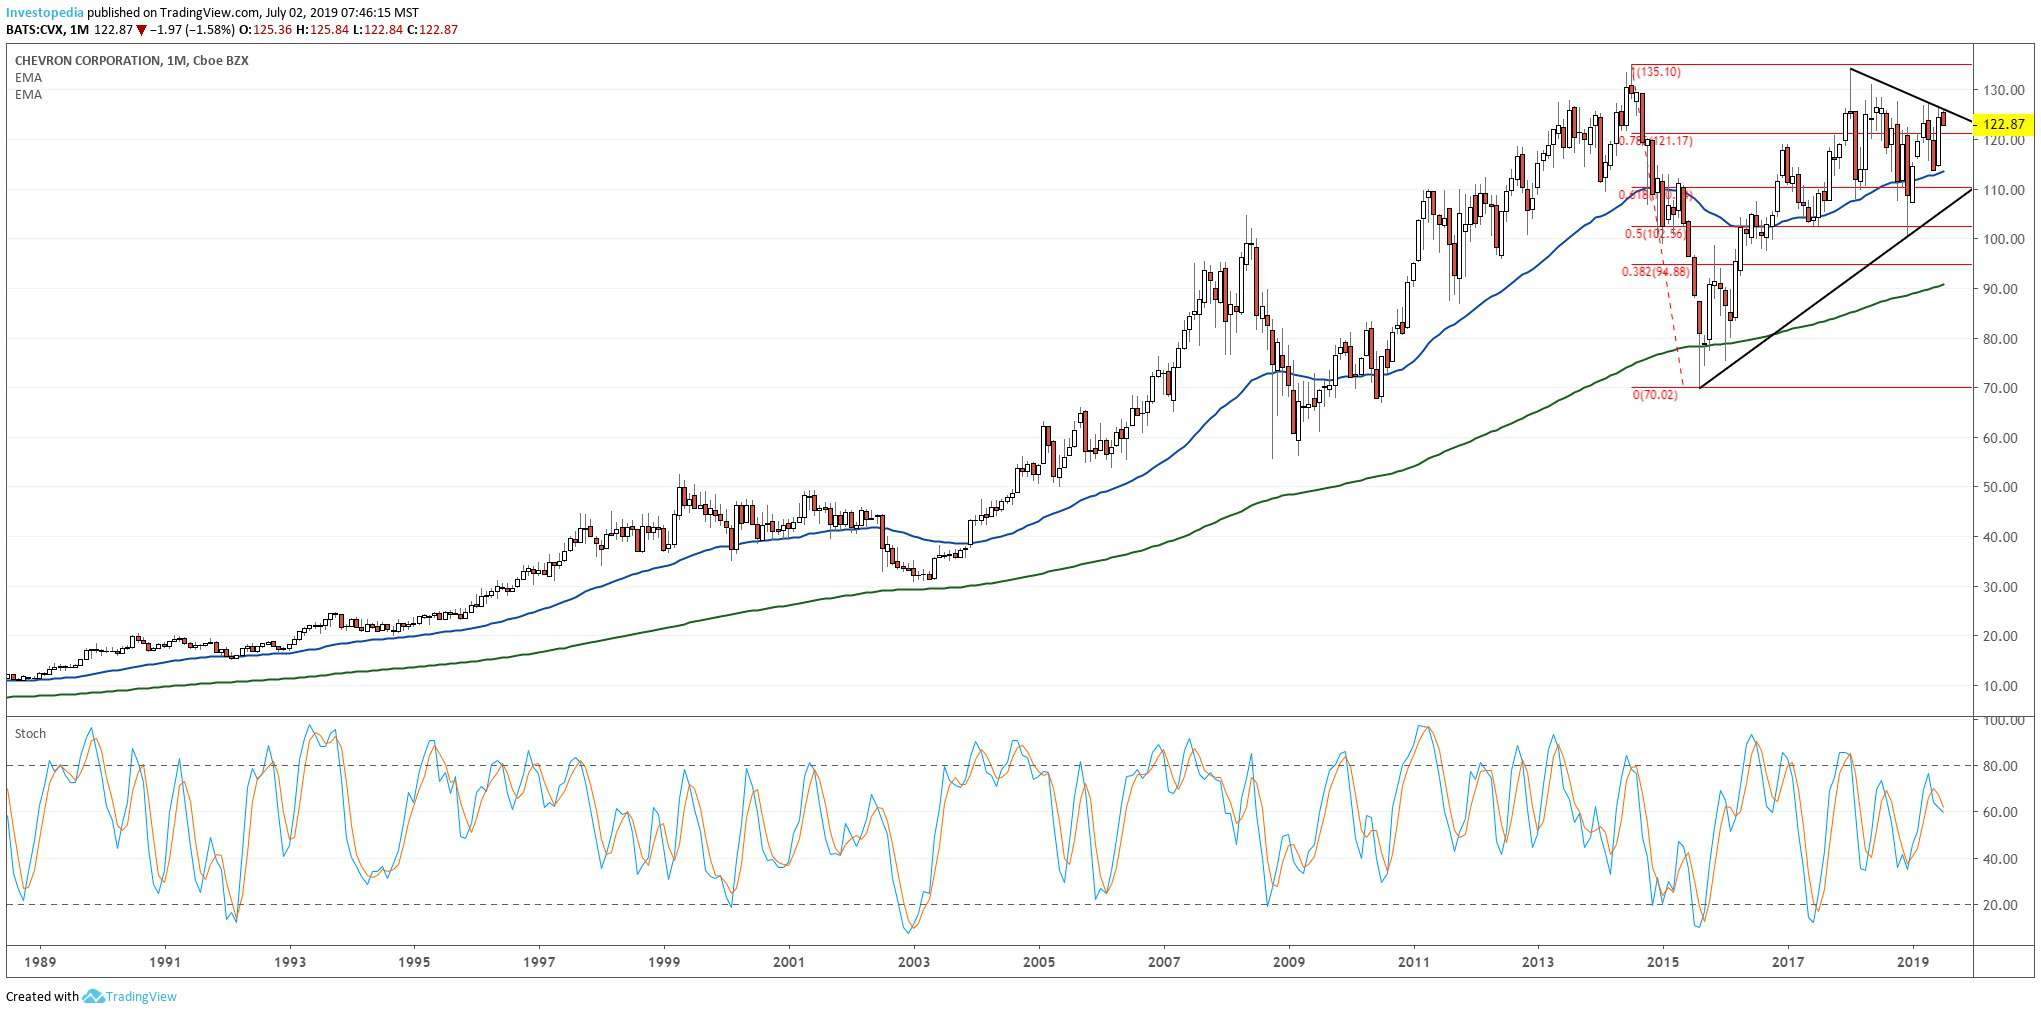 Chevron Stock at Cusp of Major Uptrend